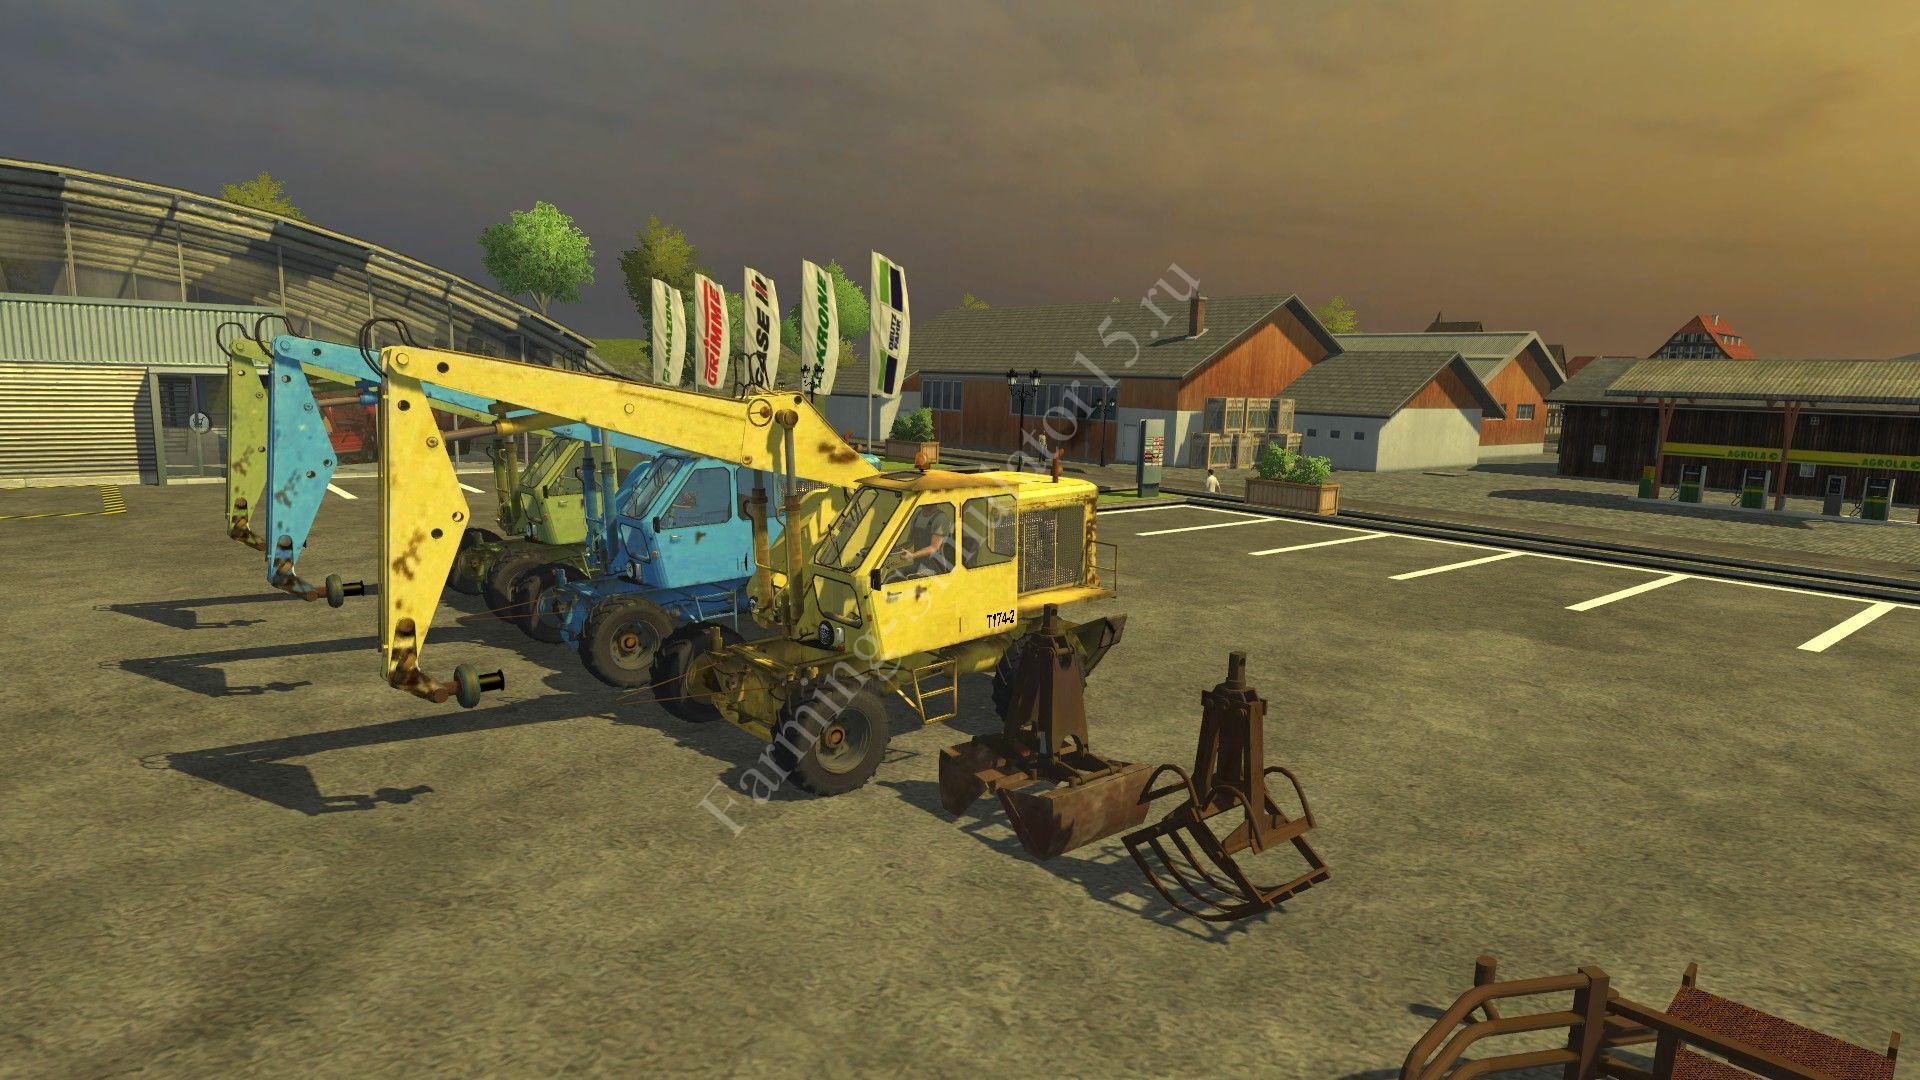 Мод экскаватора Modpack T174 2 v 7.0 Farming Simulator 2013, Farming Simulator 13